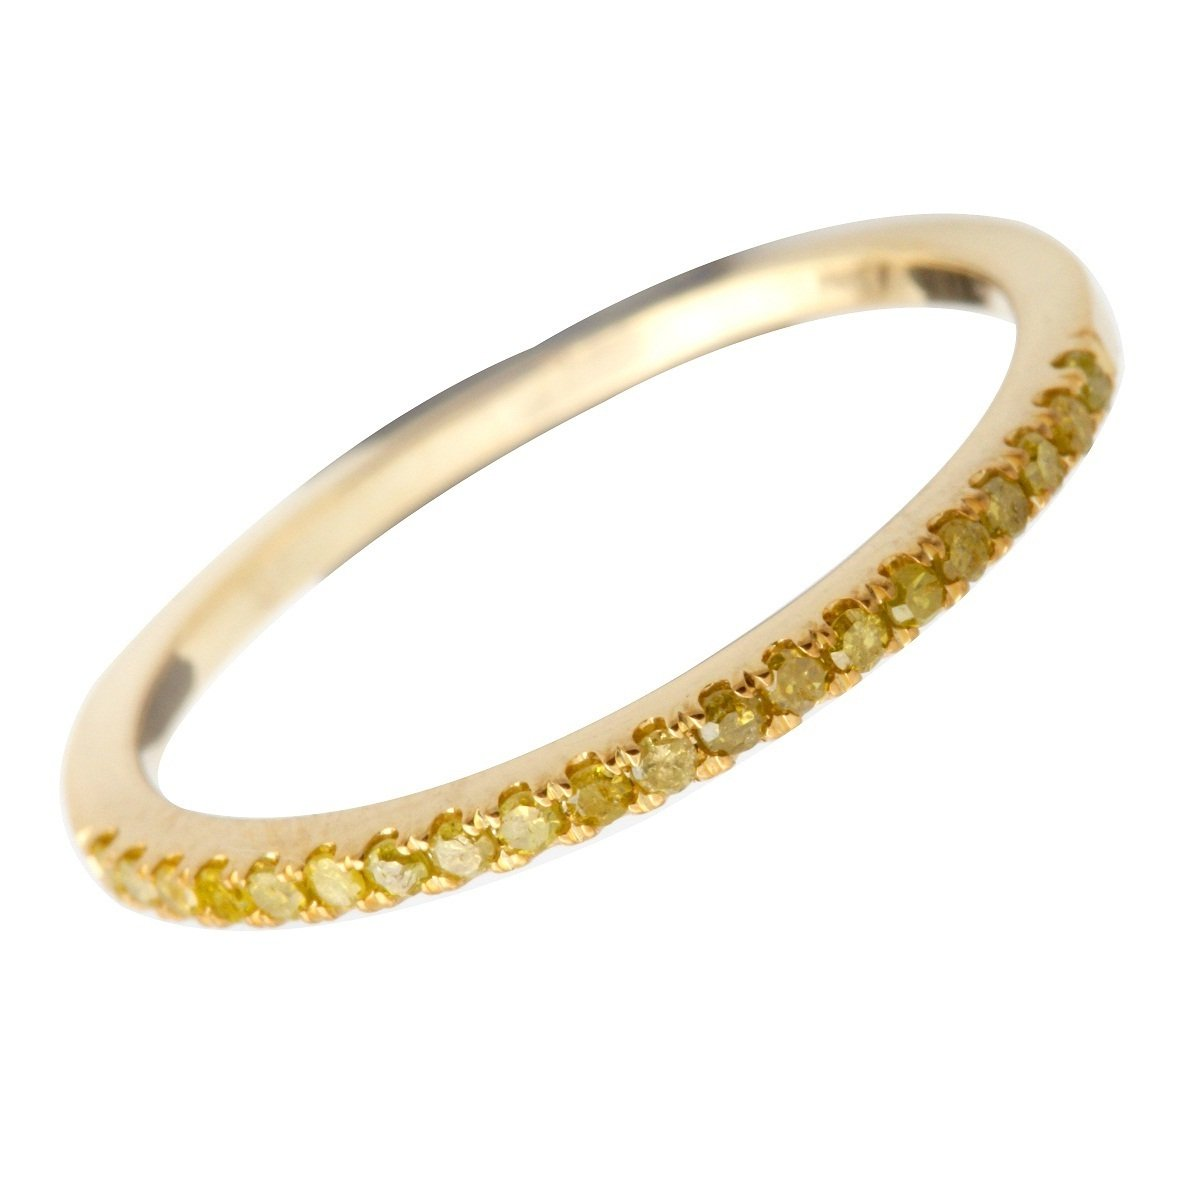 Goldenstar 0.15Ct Round Yellow Diamond Half Eternity Anniversary Band,10k Yellow Gold Size 9